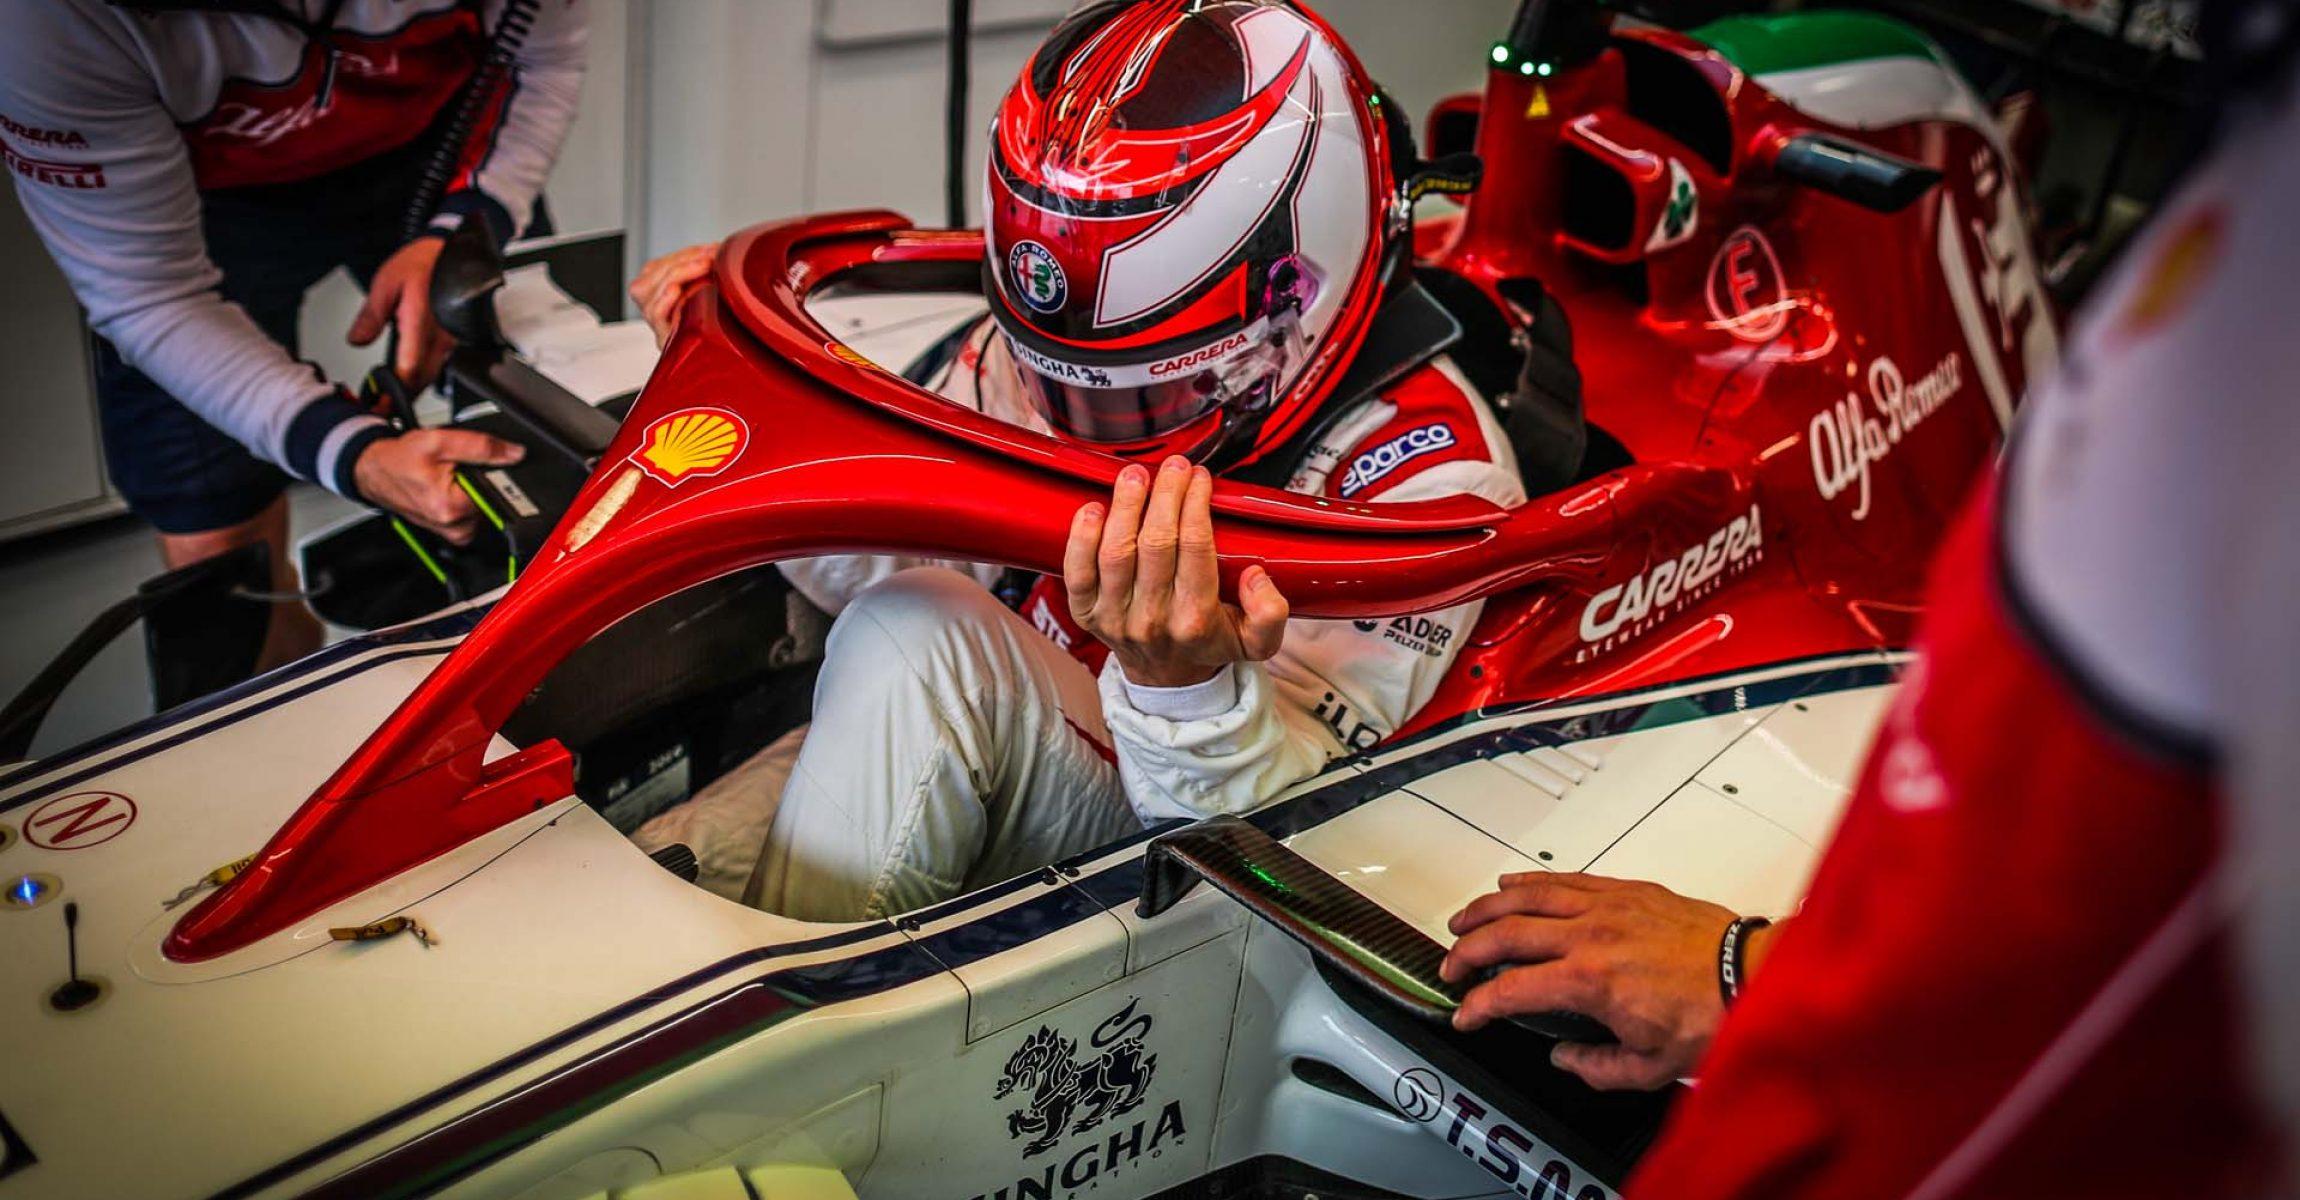 RAIKKONEN Kimi Räikkönen (fin), Alfa Romeo Racing C38, portrait during 2019 Formula 1 FIA world championship, Italy Grand Prix, at Monza from september 5 to 9  - Photo Antonin Vincent / DPPI